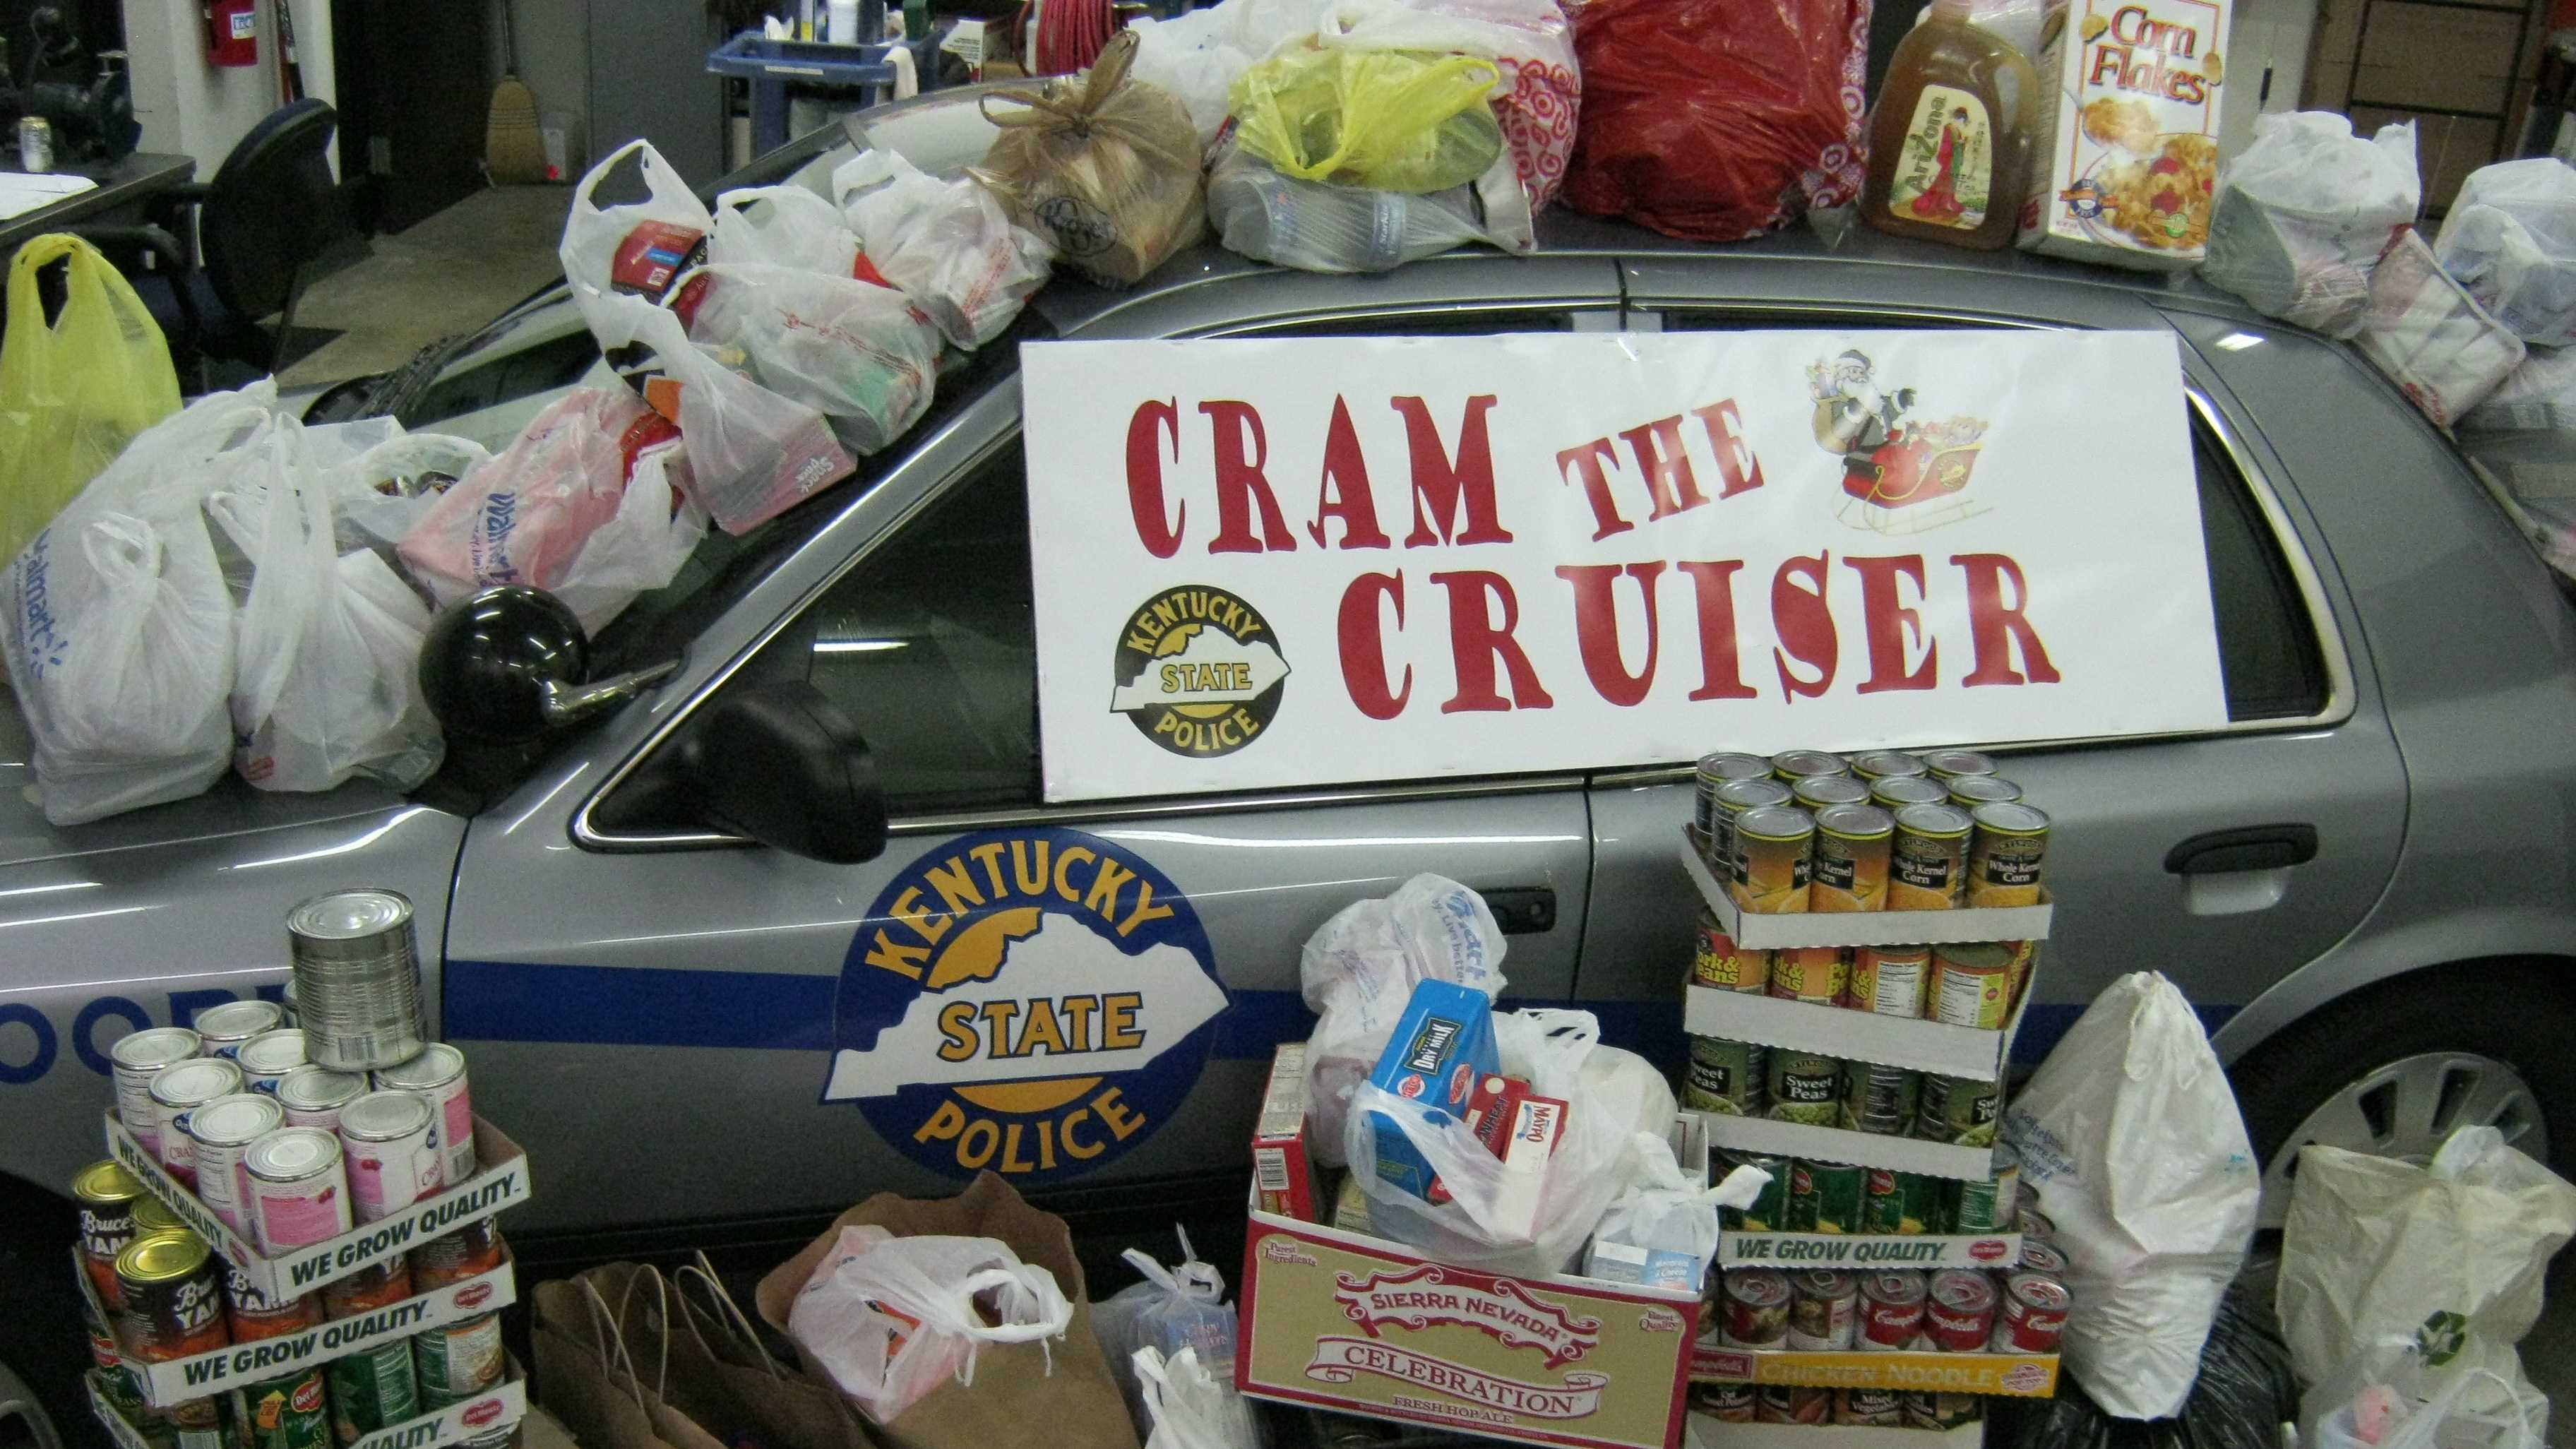 KSP Cram the Cruiser